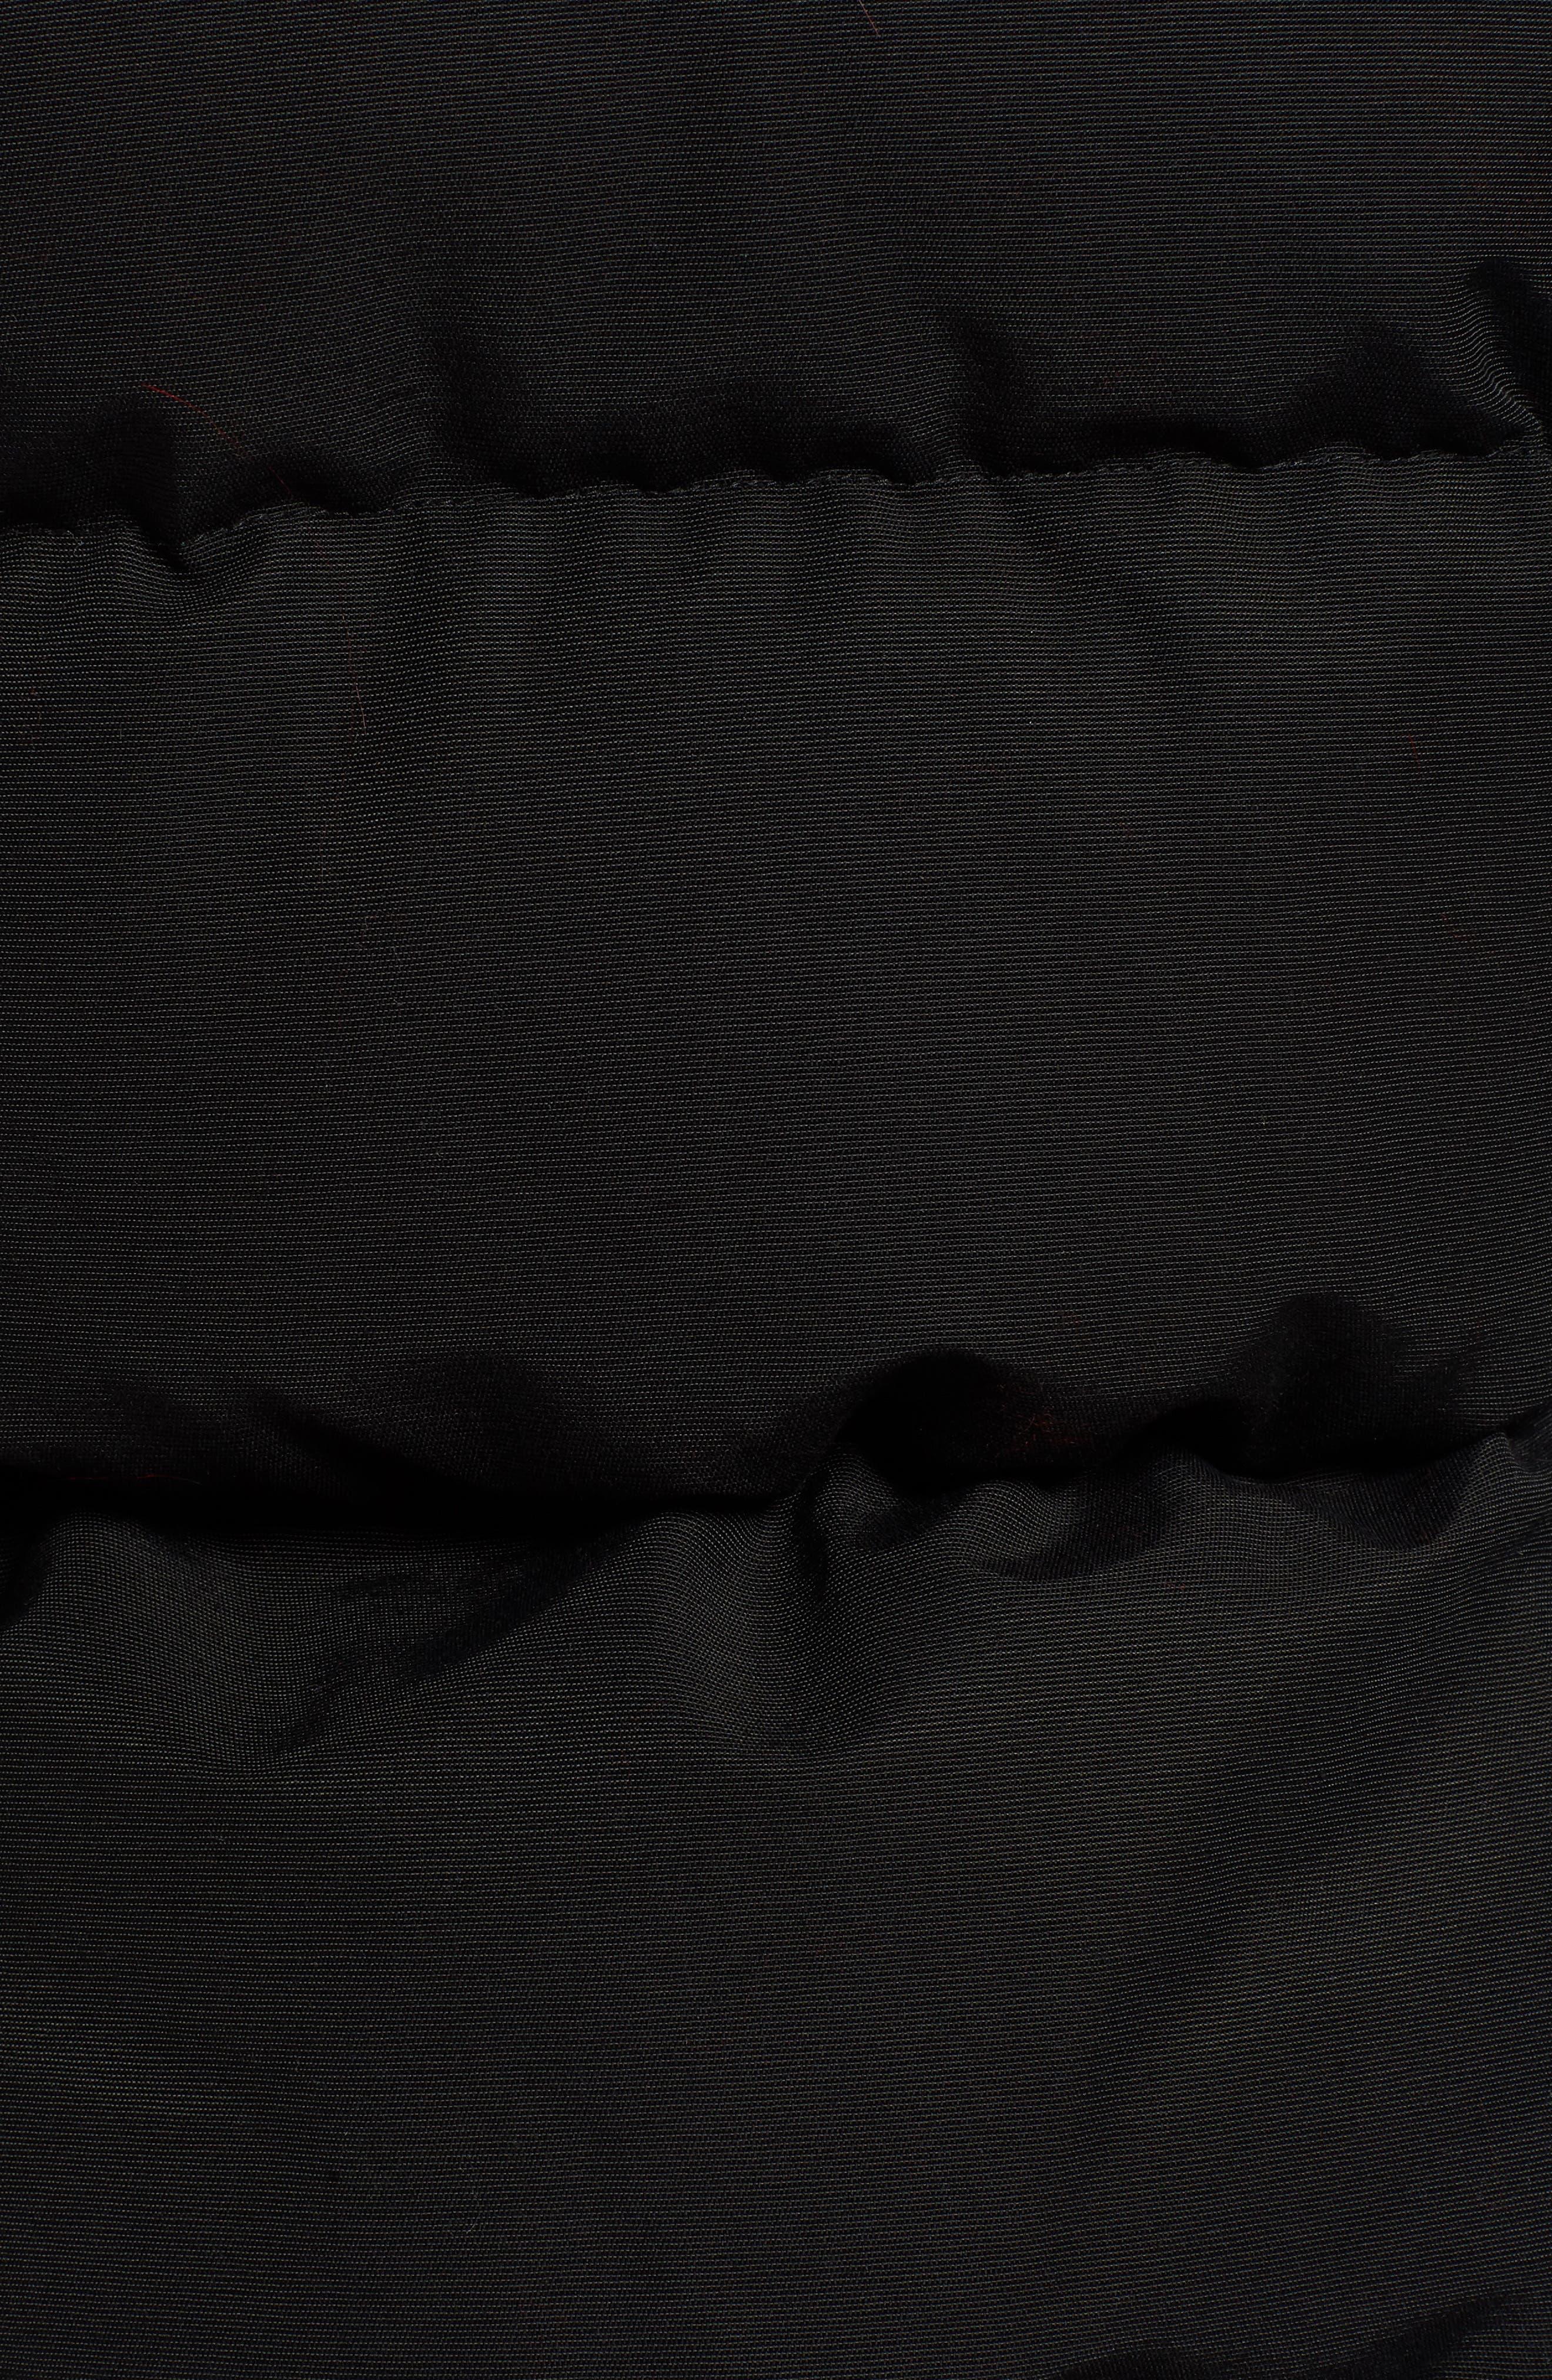 Harper Genuine Fox Fur Trim Down Parka,                             Alternate thumbnail 6, color,                             BLACK/ SCARLET FOX